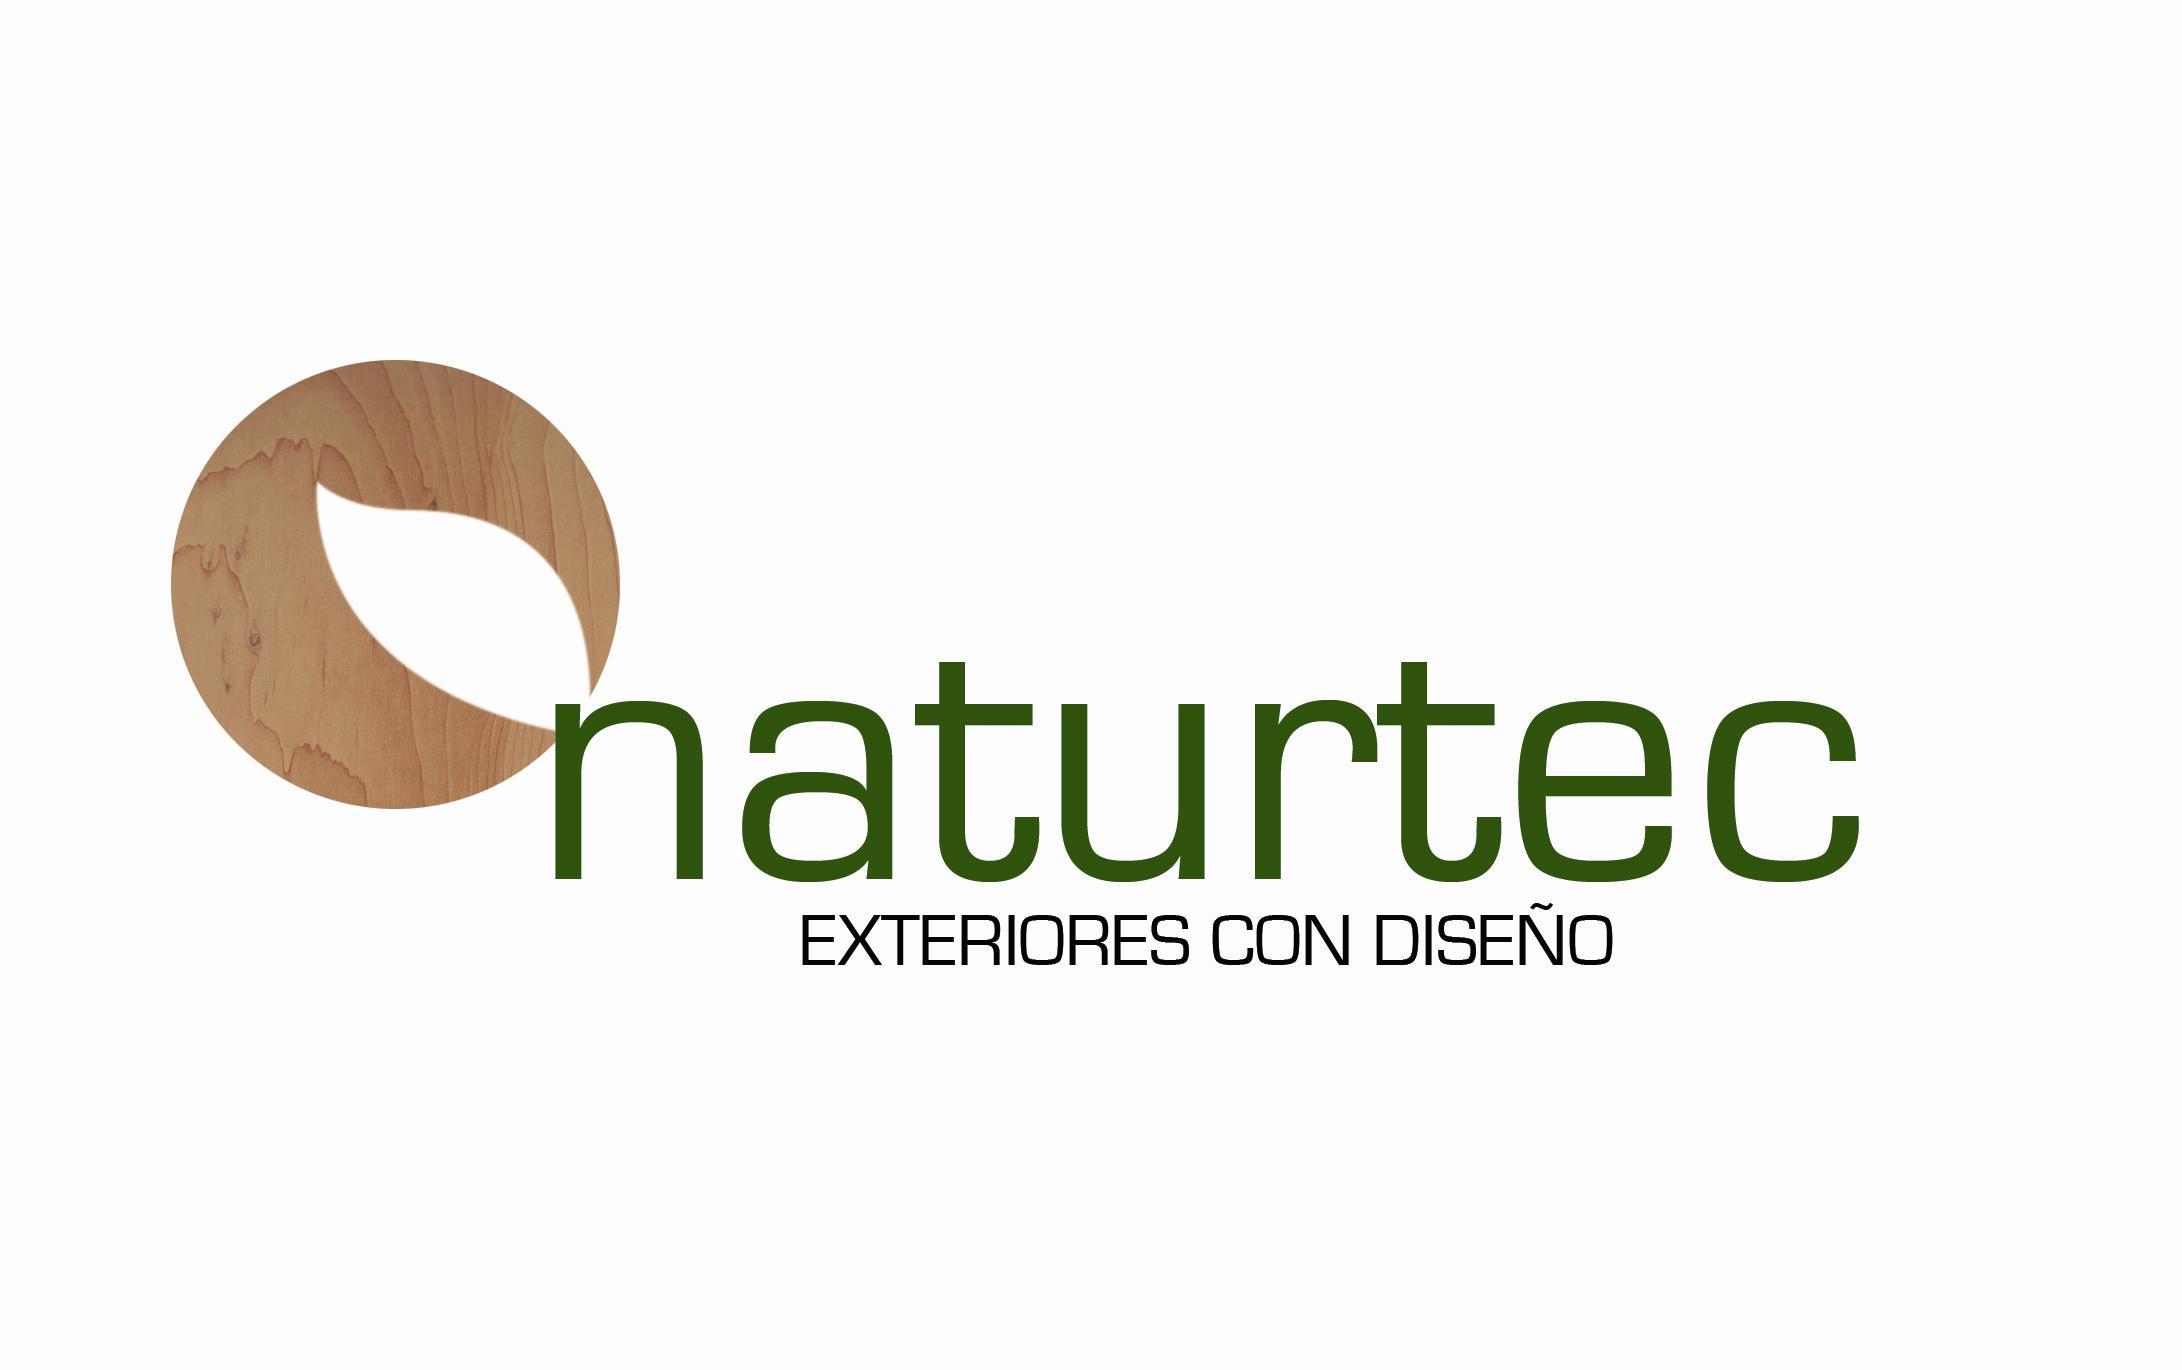 Naturtec, Exteriores Con Diseño